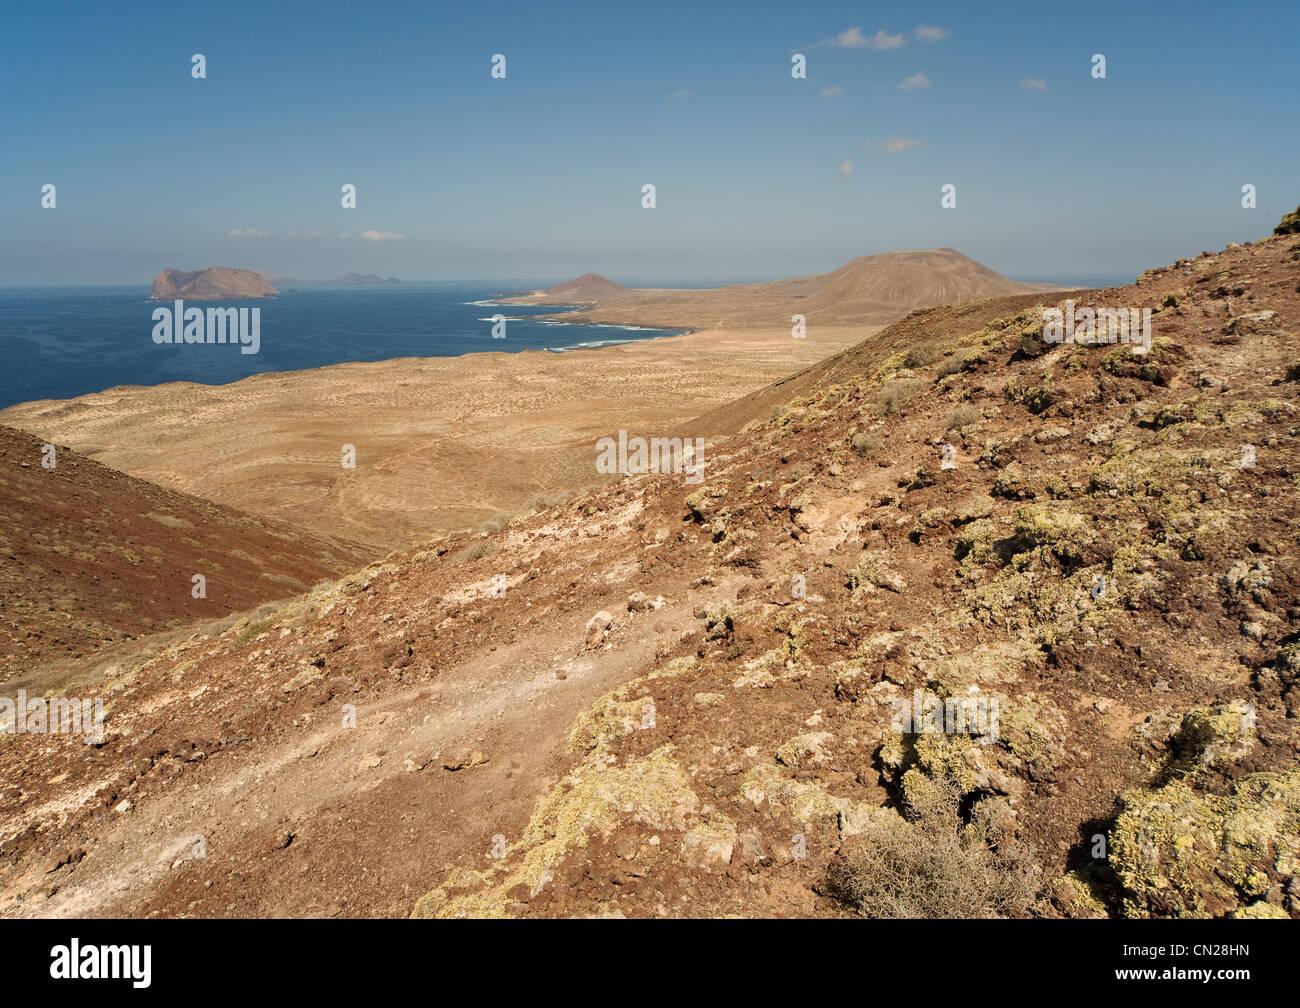 Looking from the island of La Graciosa towards Isla de Montaña Clara, Canary Islands, Canaries, Spain - Stock Image